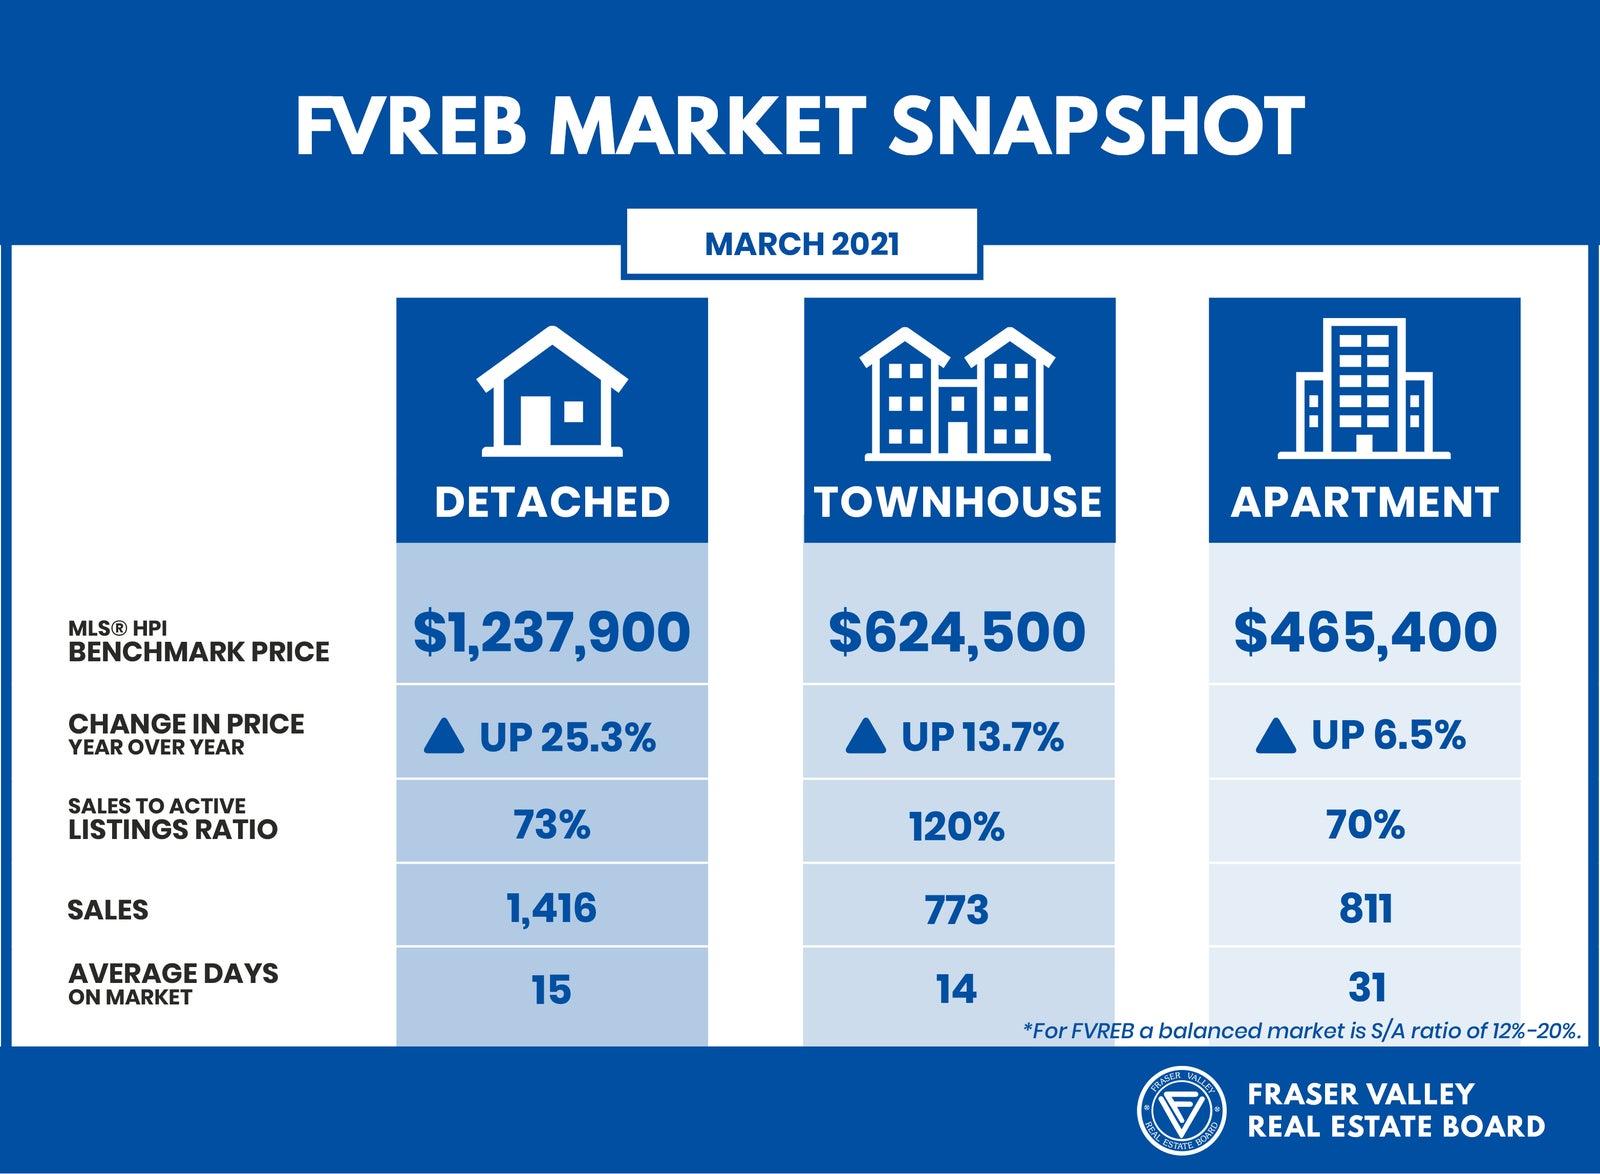 Market Snapshot March 2021 - FVREB